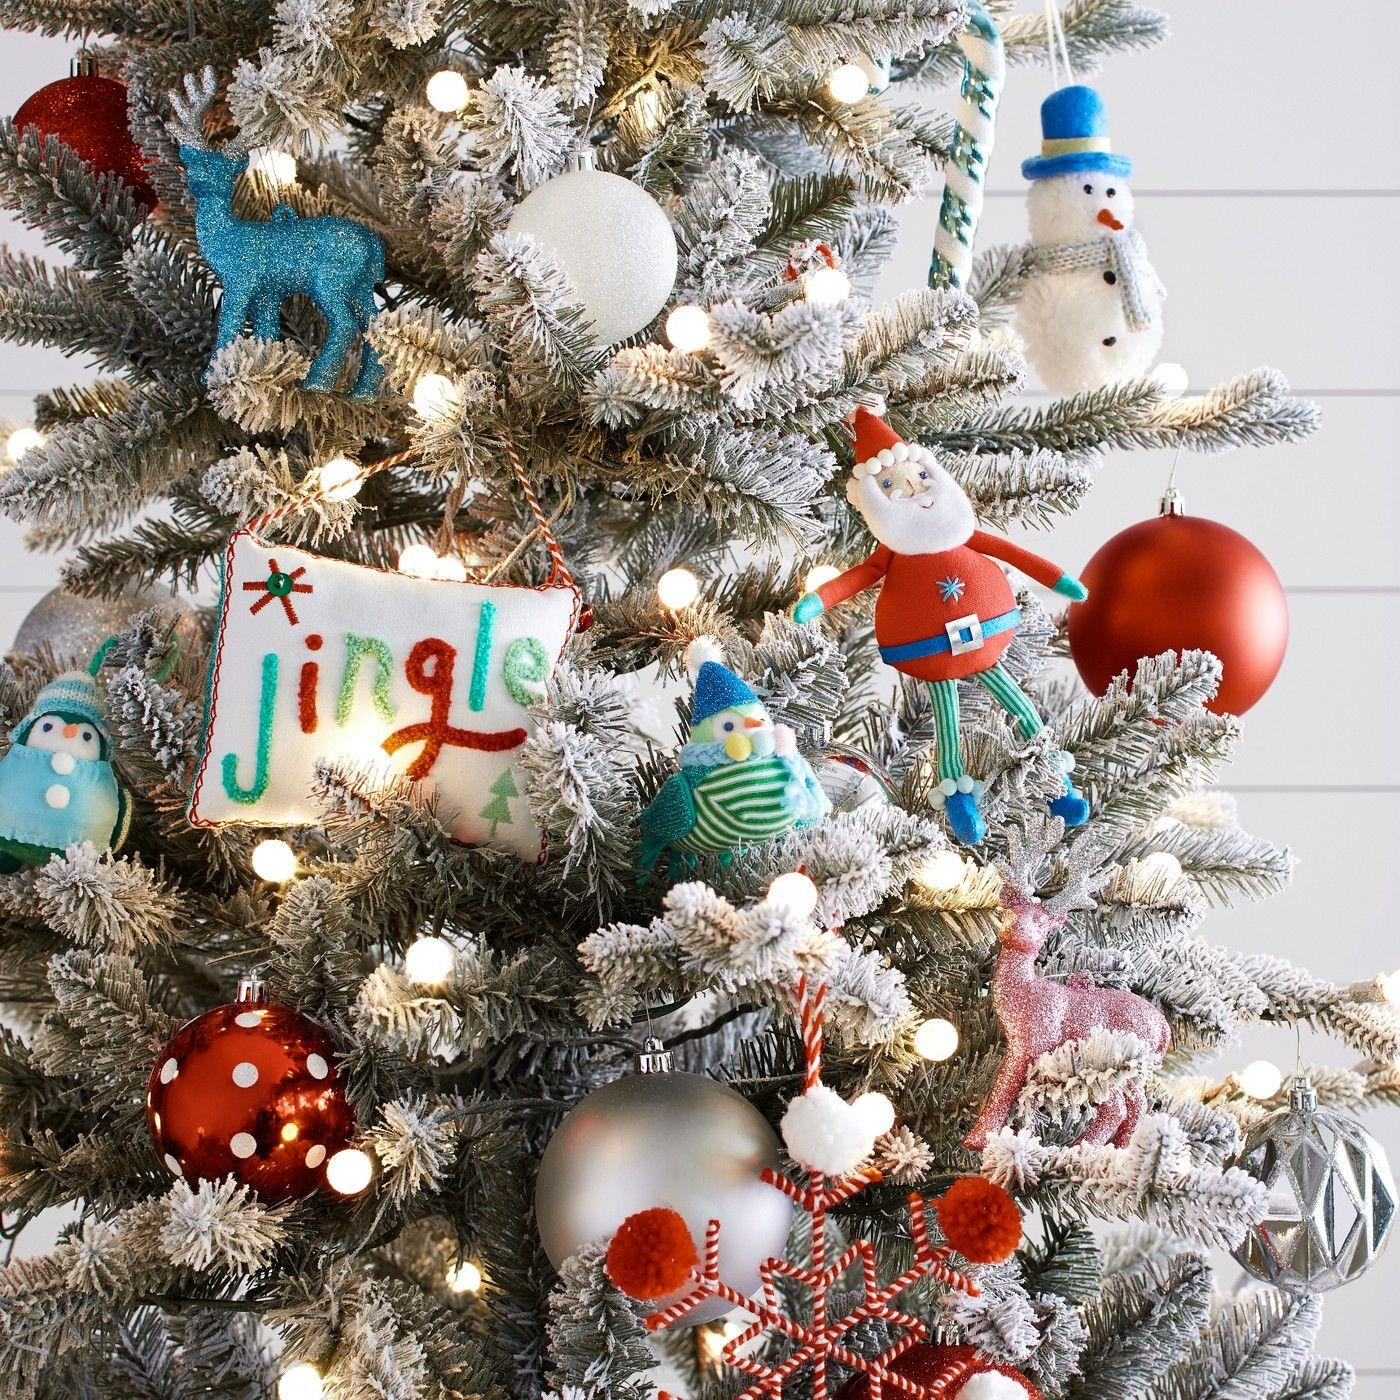 Target Merry Lane Christmas Ornament Kit Wondershop Weihnachtsschmuck Rustikal Urlaub Dekorieren Christbaumschmuck